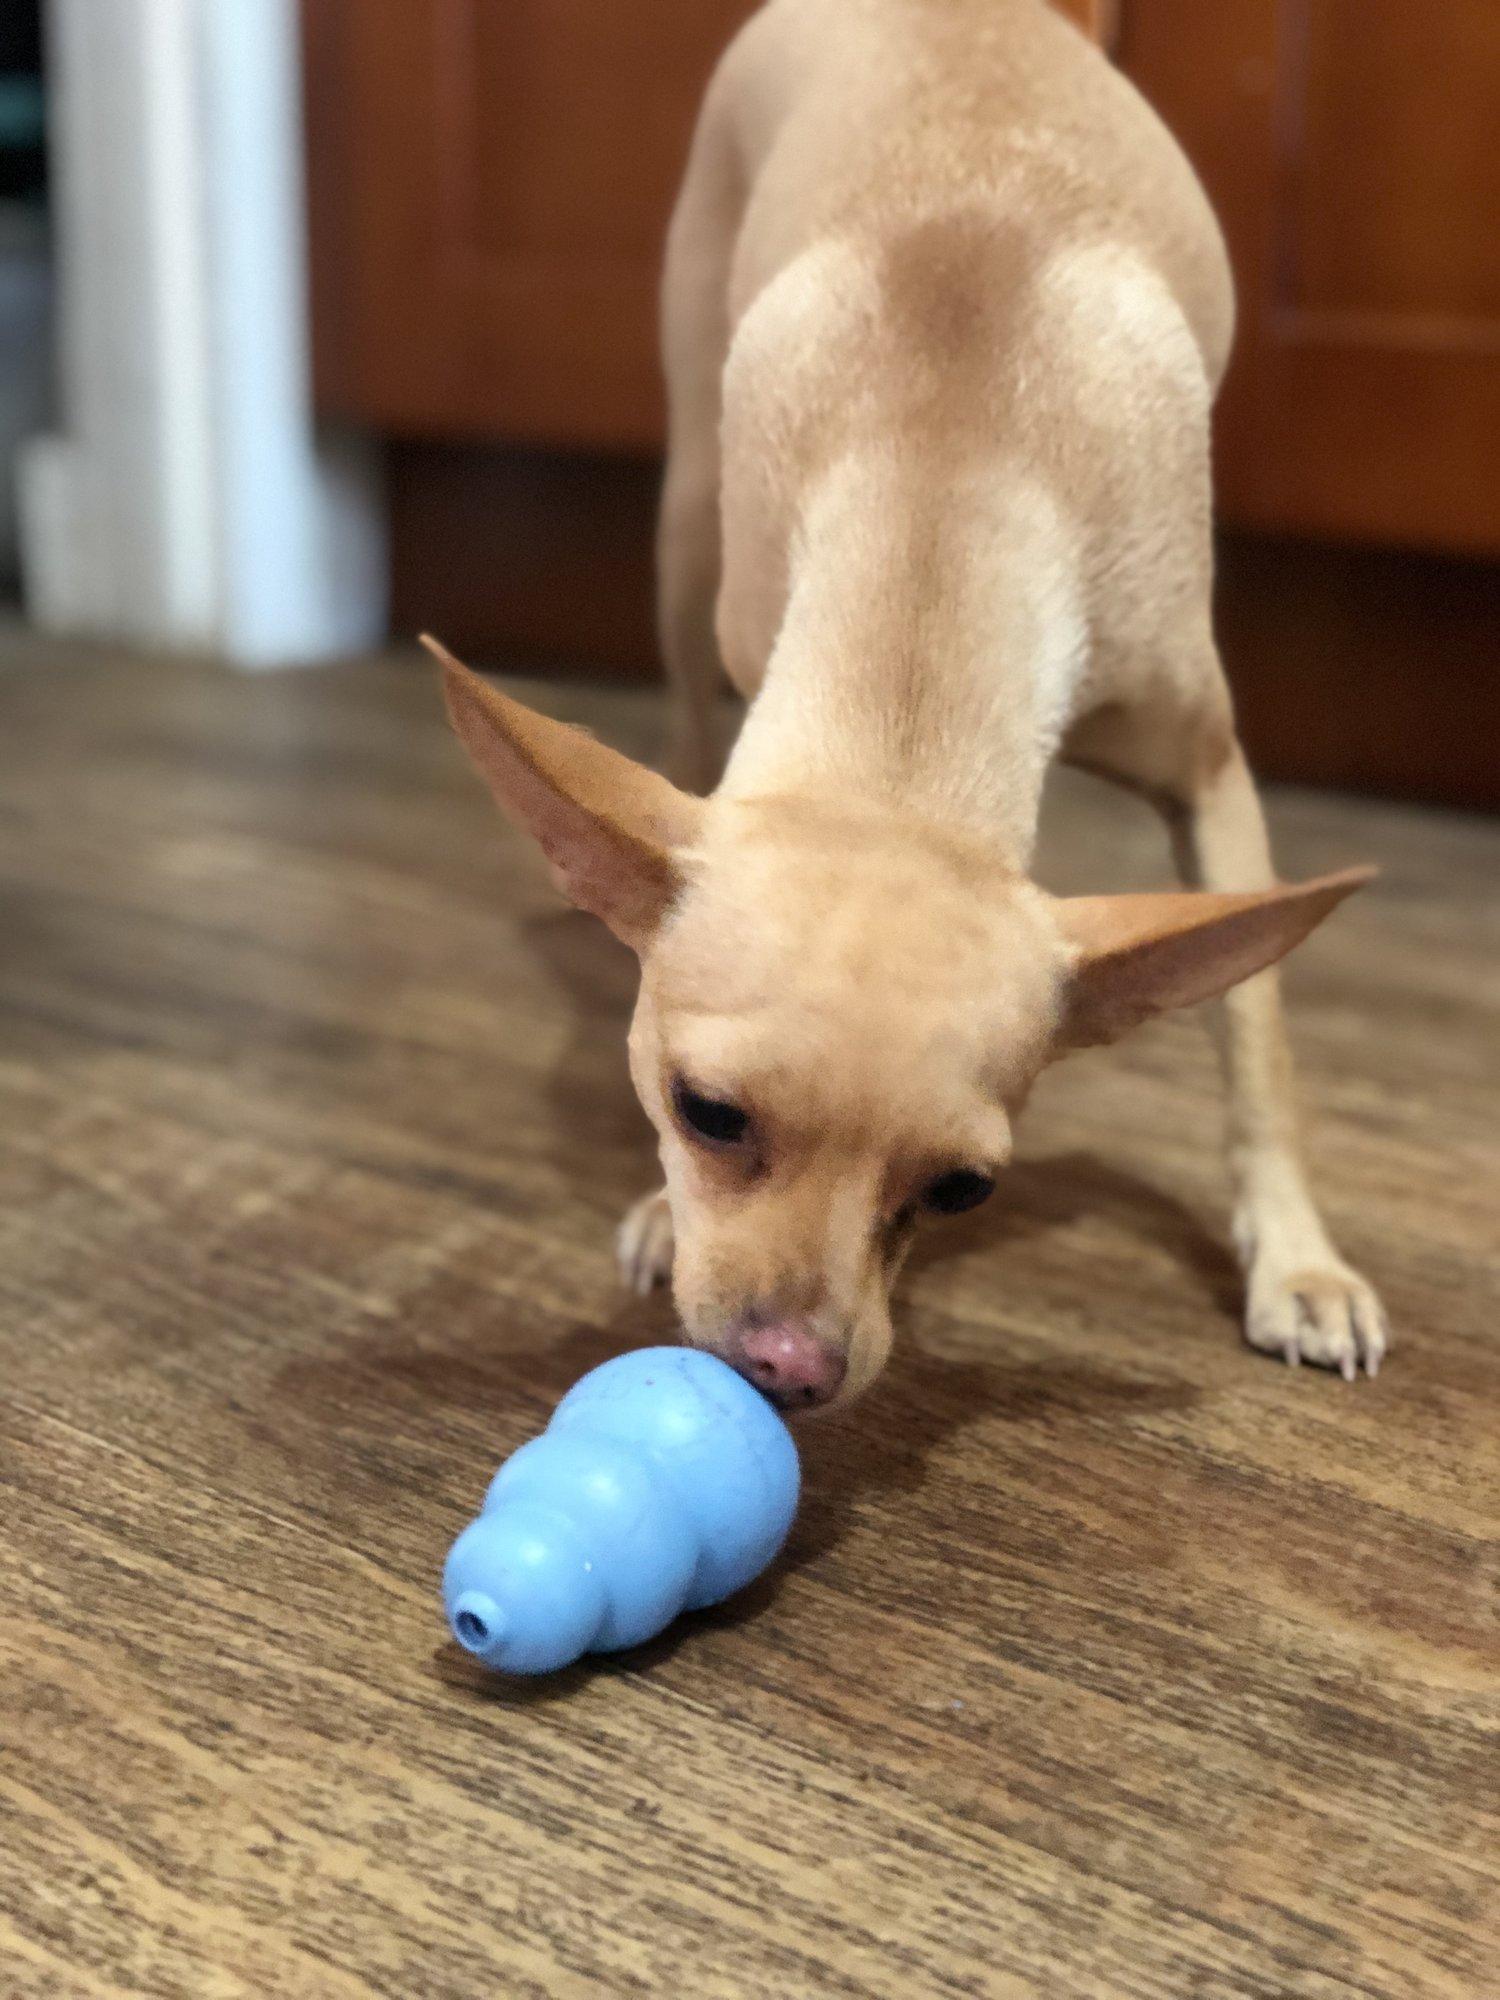 Pasadena Heat Wave affecting your dog? Break out the KONGsicles.